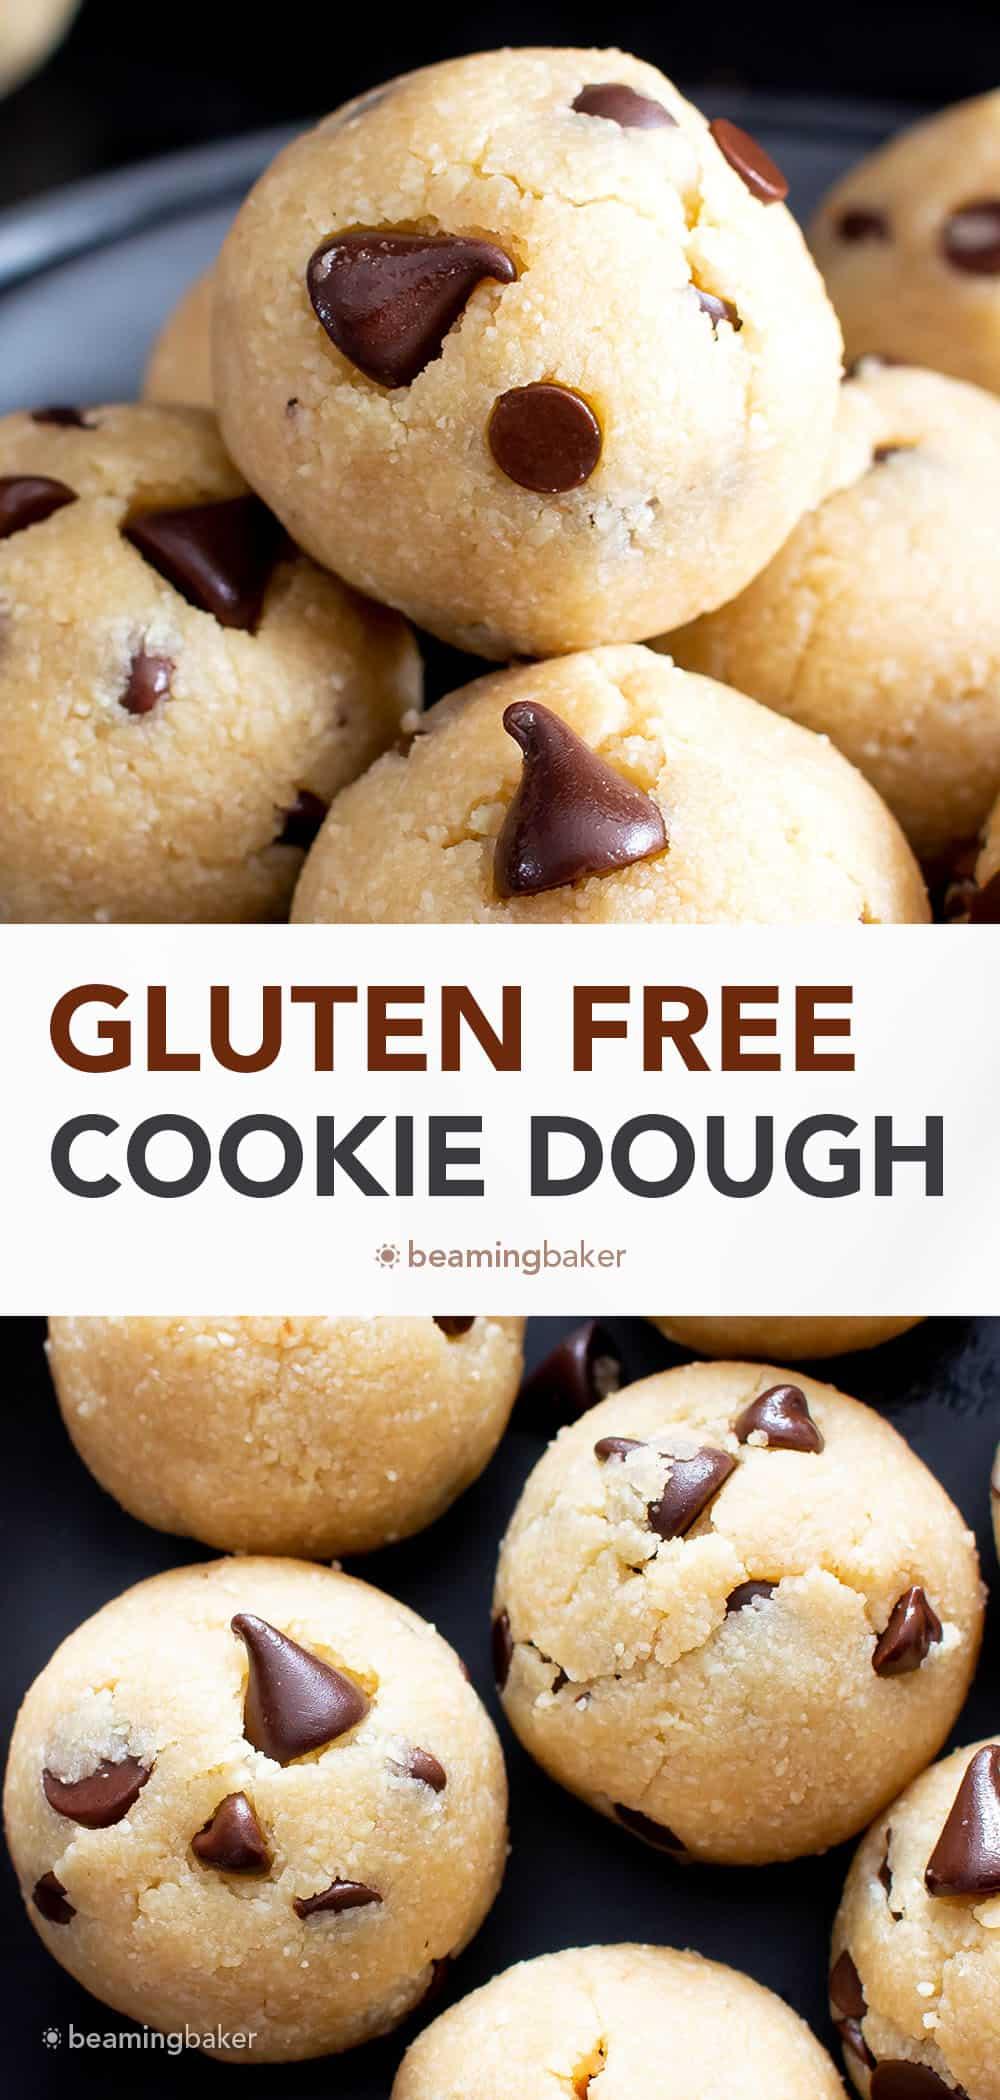 Gluten Free Edible Cookie Dough (GF): the easiest gluten free edible cookie dough—made with just a few simple GF ingredients. This gluten free cookie dough recipe yields rich 'n satisfying cookie dough! #GlutenFree #CookieDough #GF #EdibleCookieDough | Recipe at BeamingBaker.com